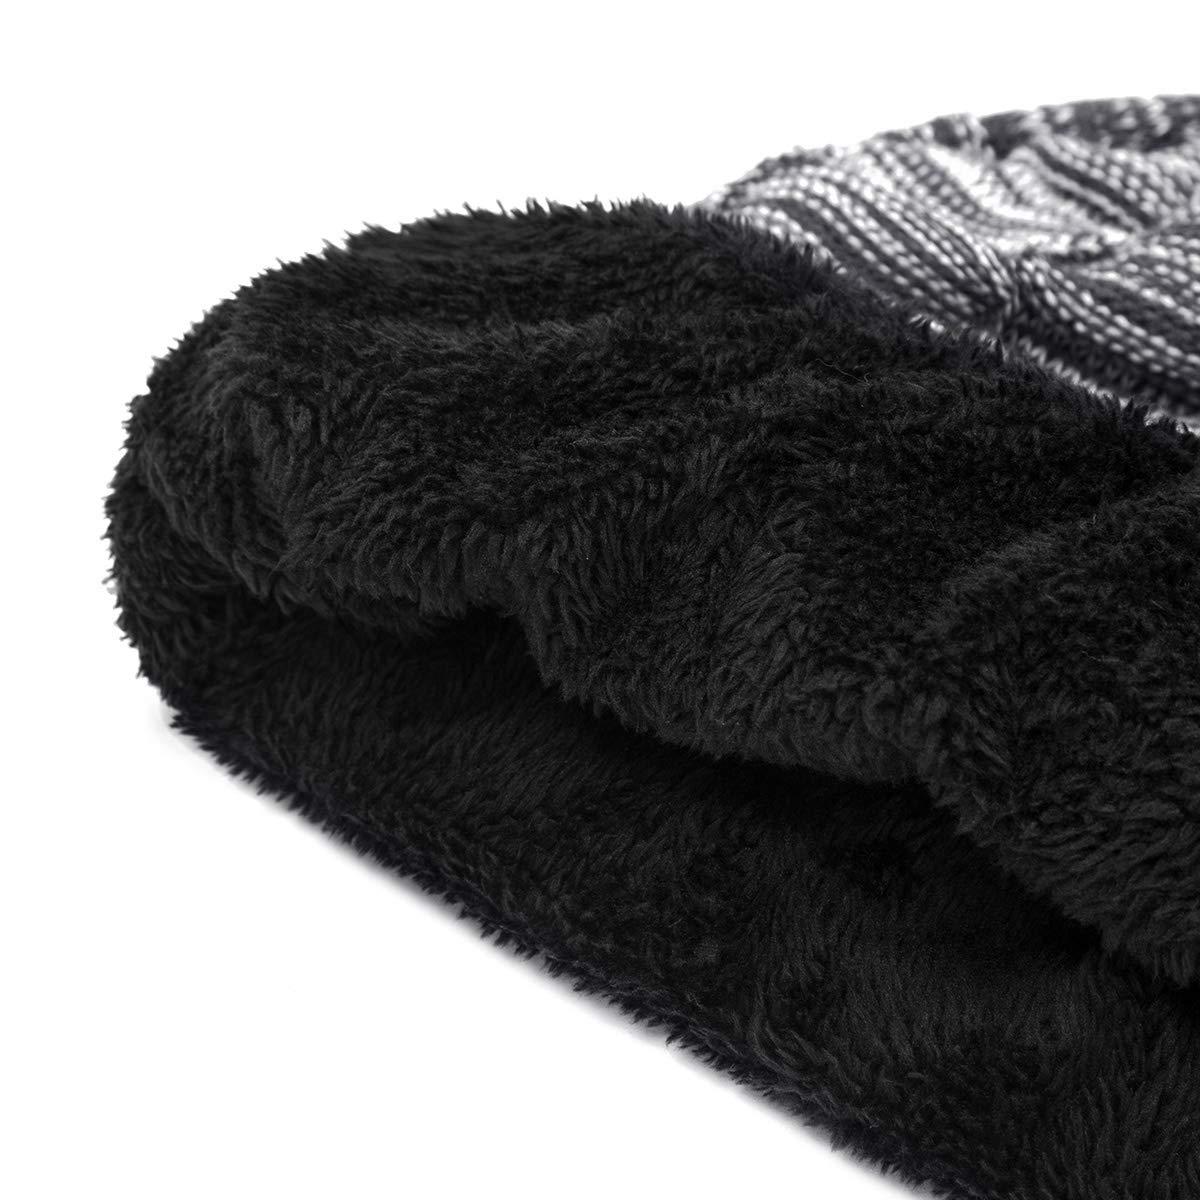 WISH CLUB Knit Beanie Hat Warm Winter Slouch Hats Soft Fleece Lining Knit Unisex Stretchy Skully Cap